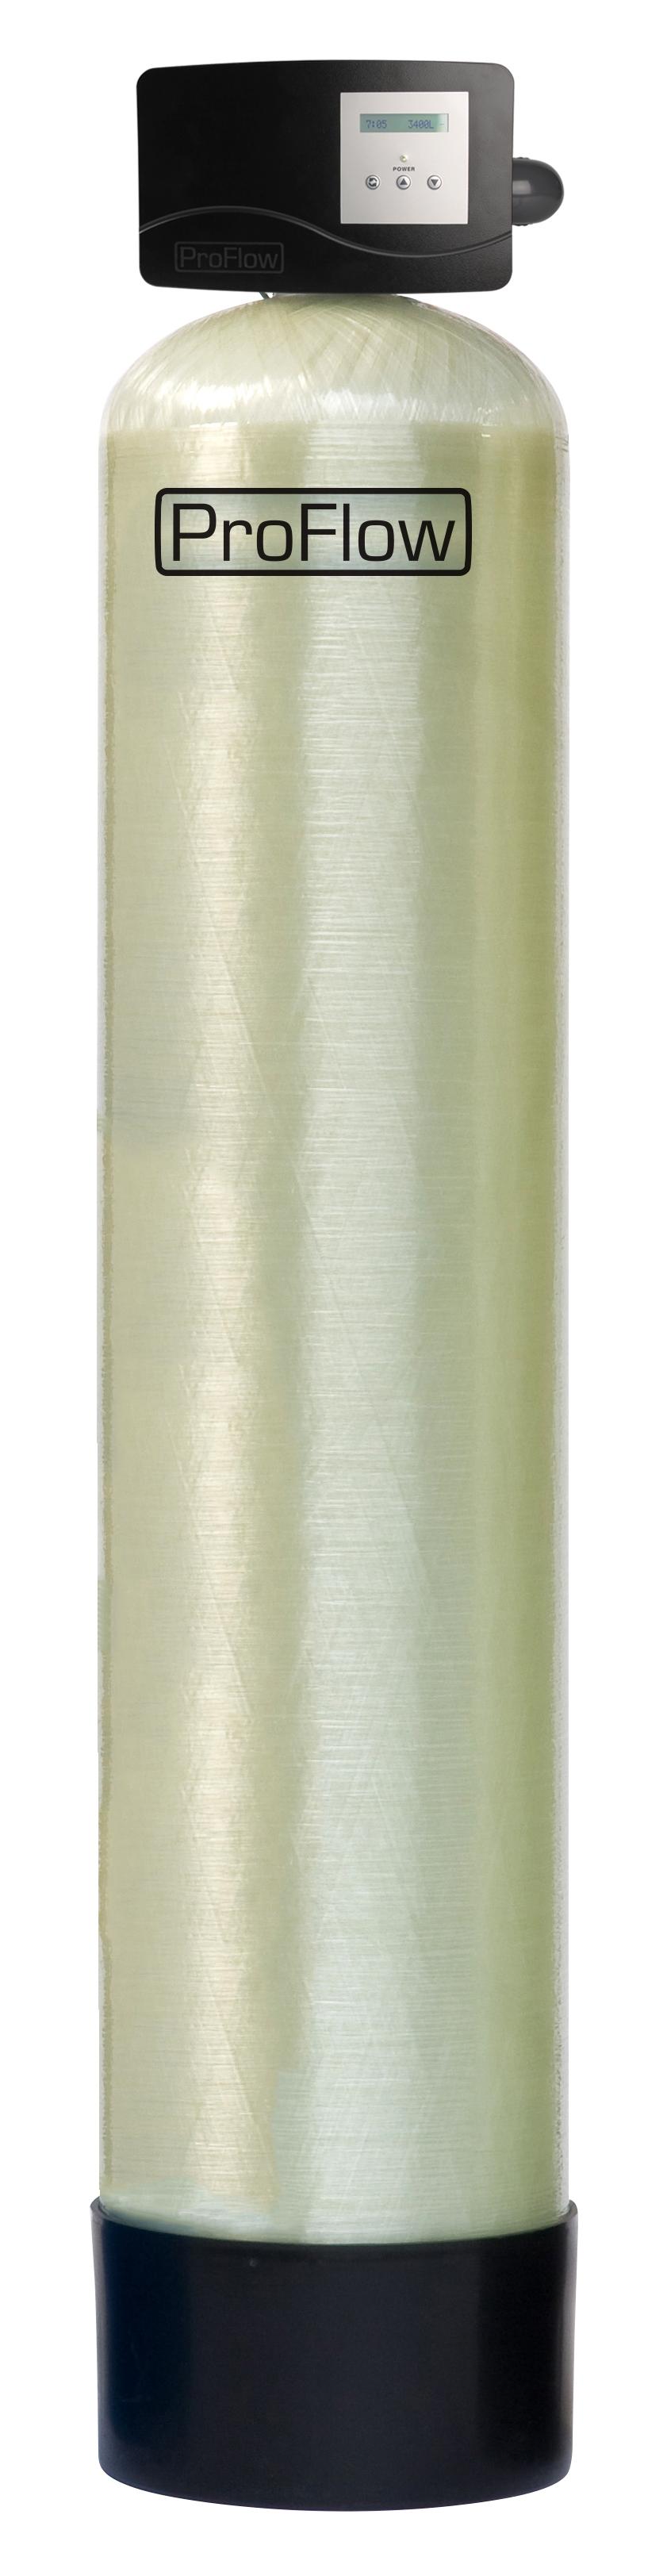 Nugeležinimo filtras PF-OXY1,5 5